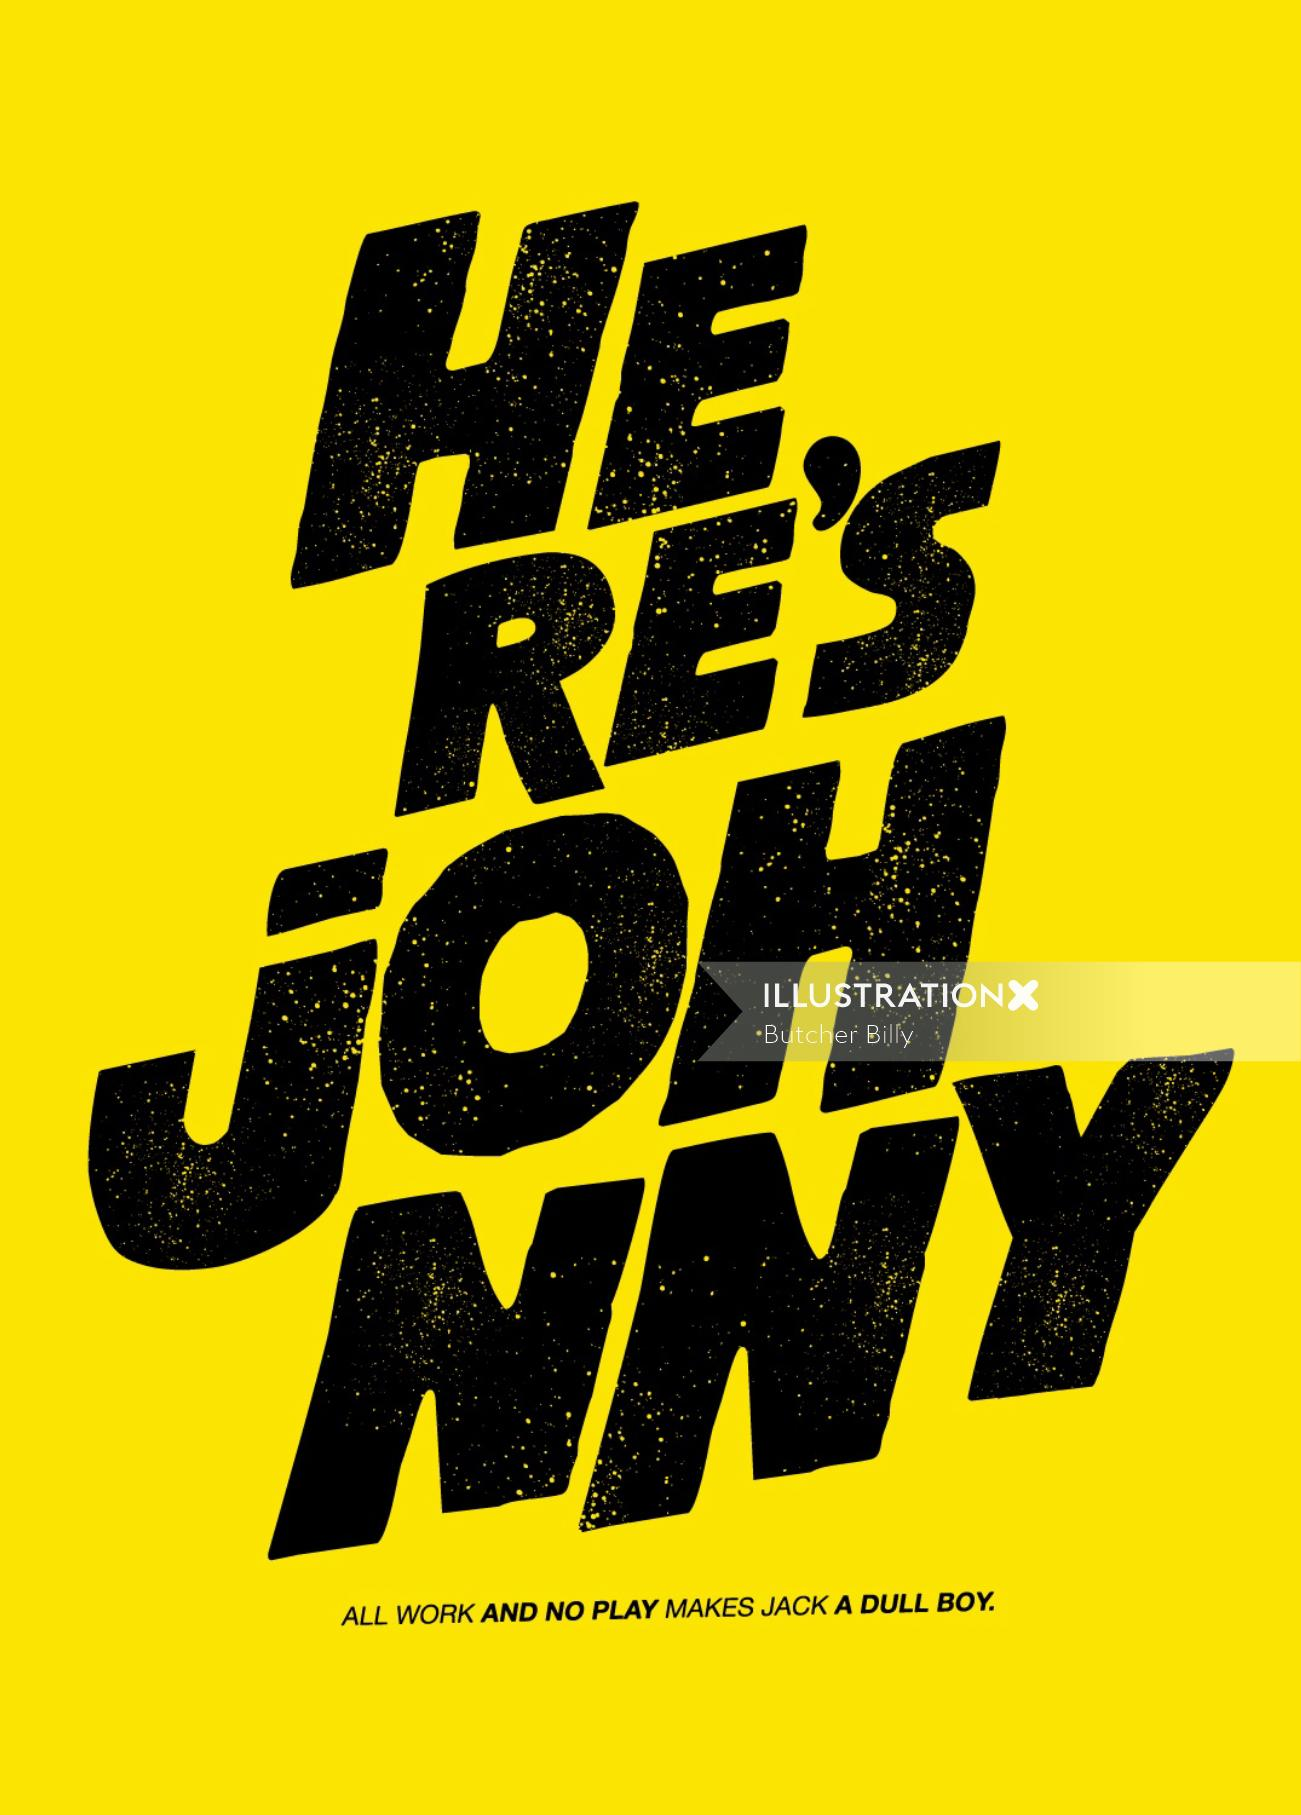 Here's Johnny Lettering Design